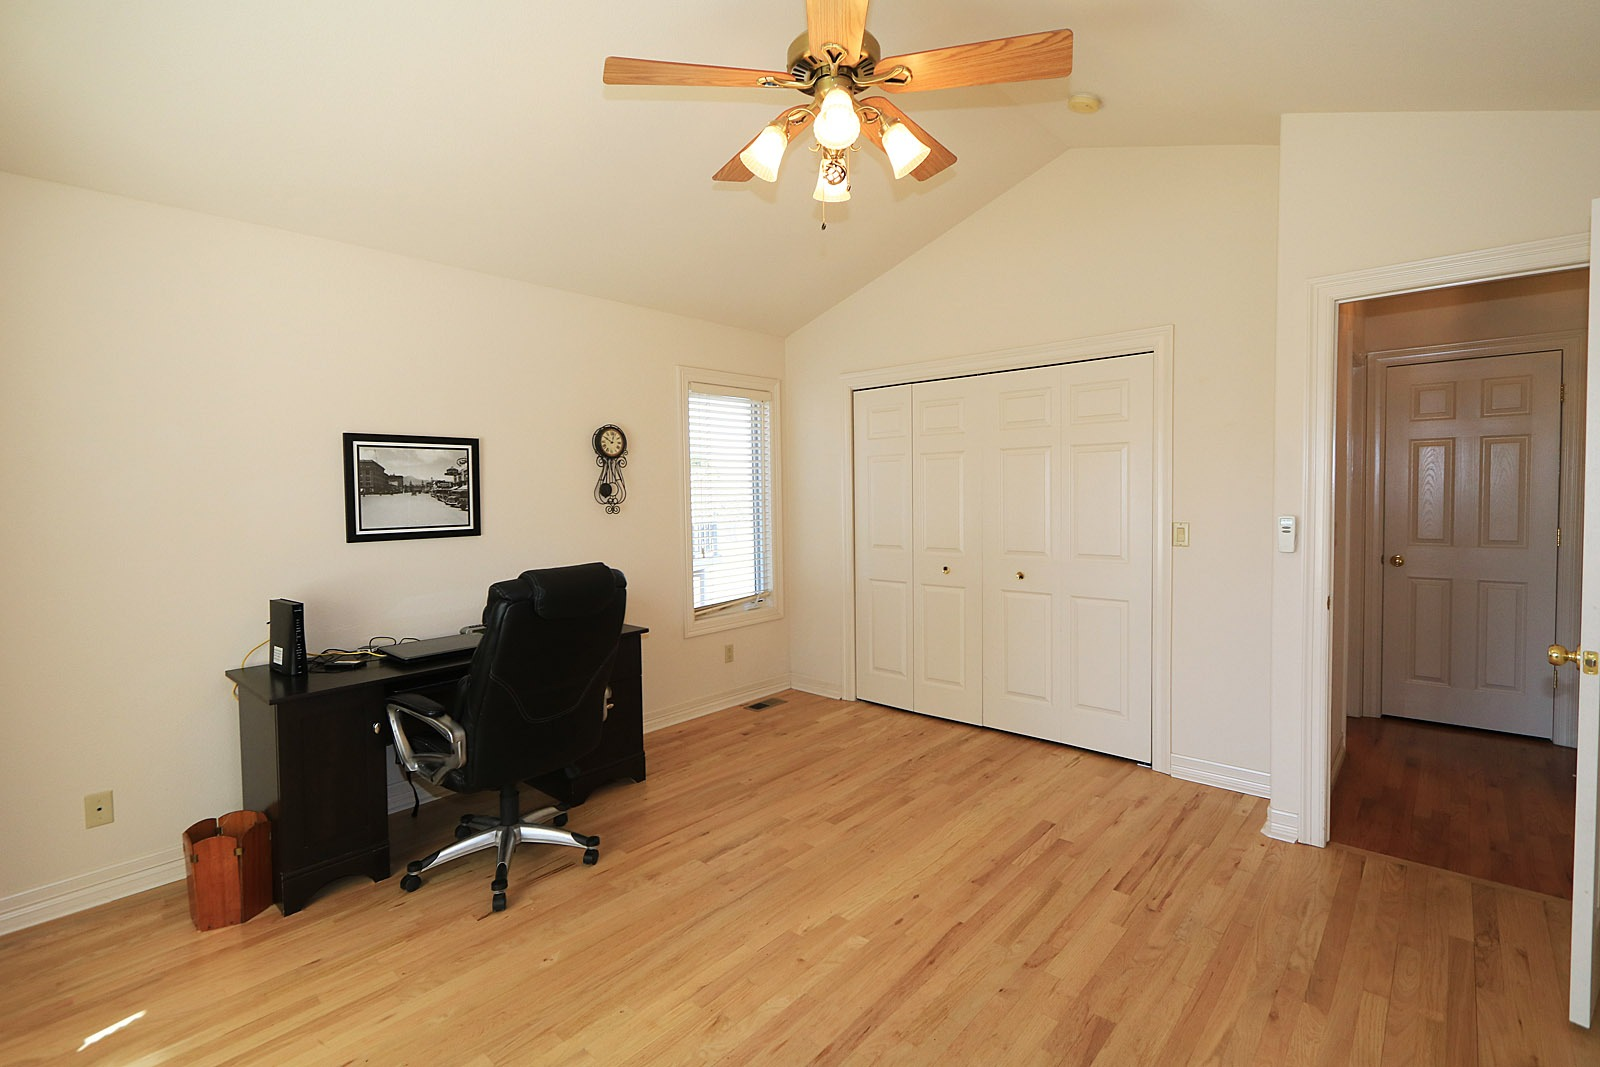 13' X 12' main floor study